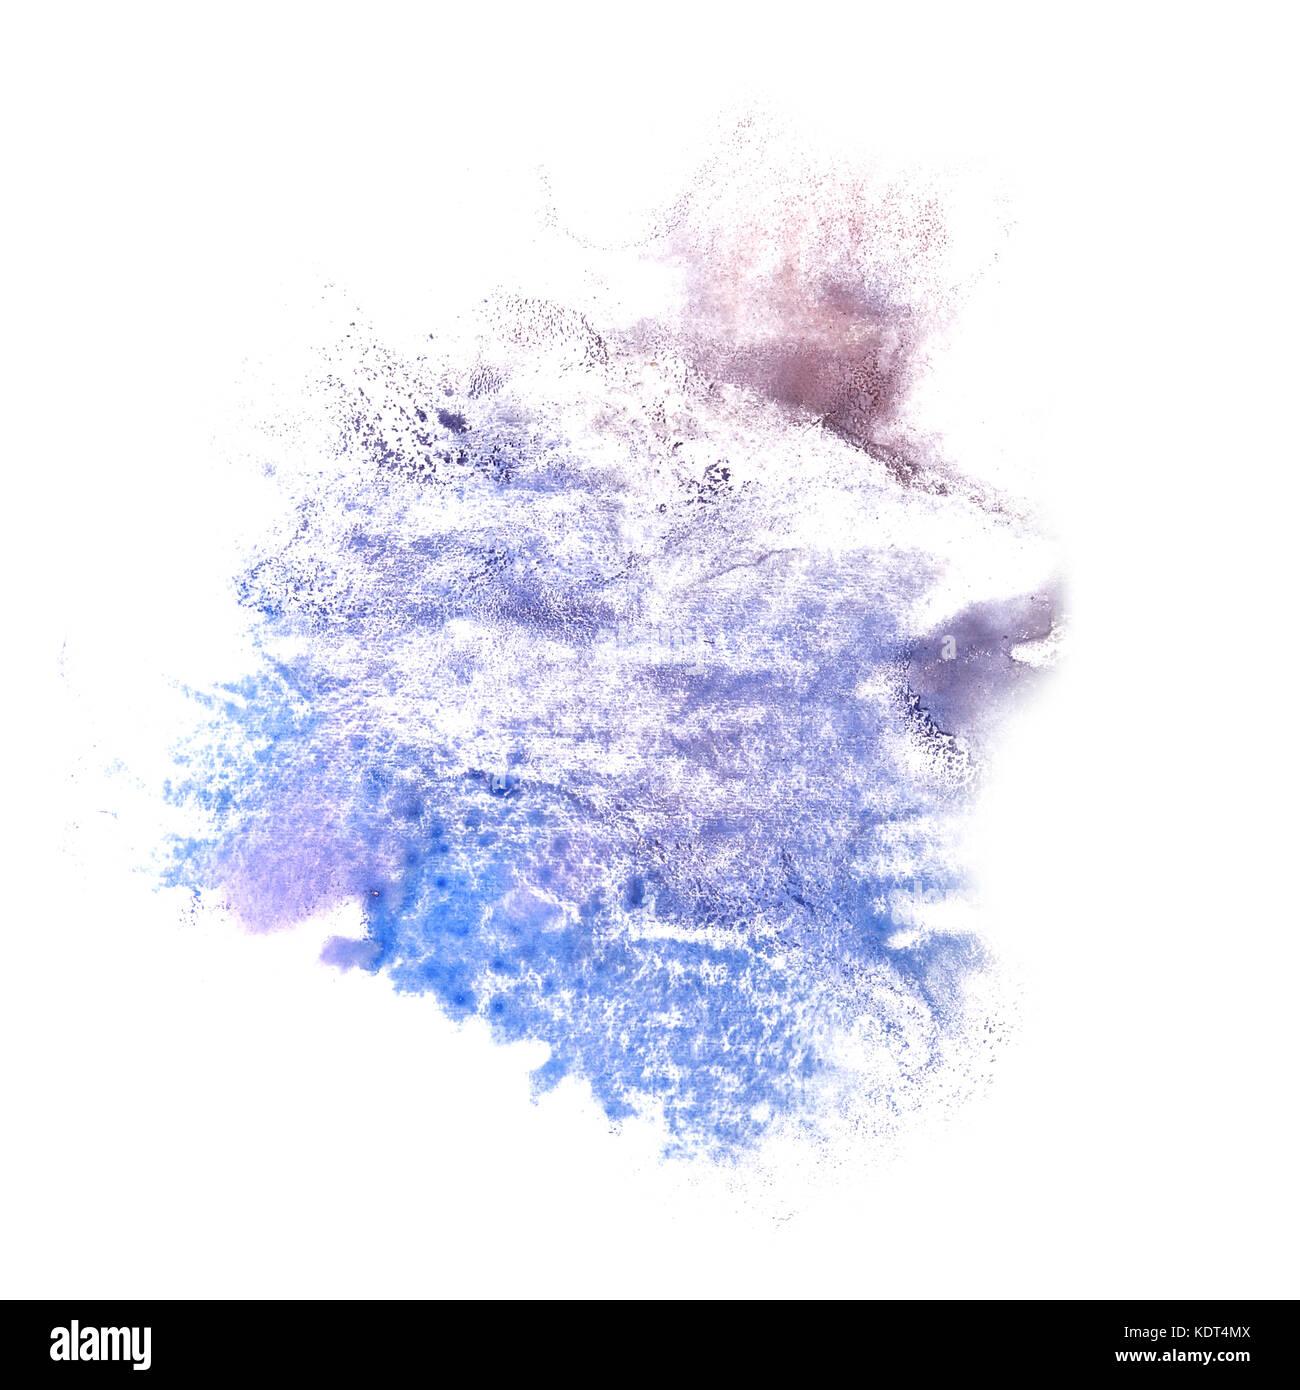 abstrakte grau, blau zeichnung schlaganfall tinte aquarell pinsel